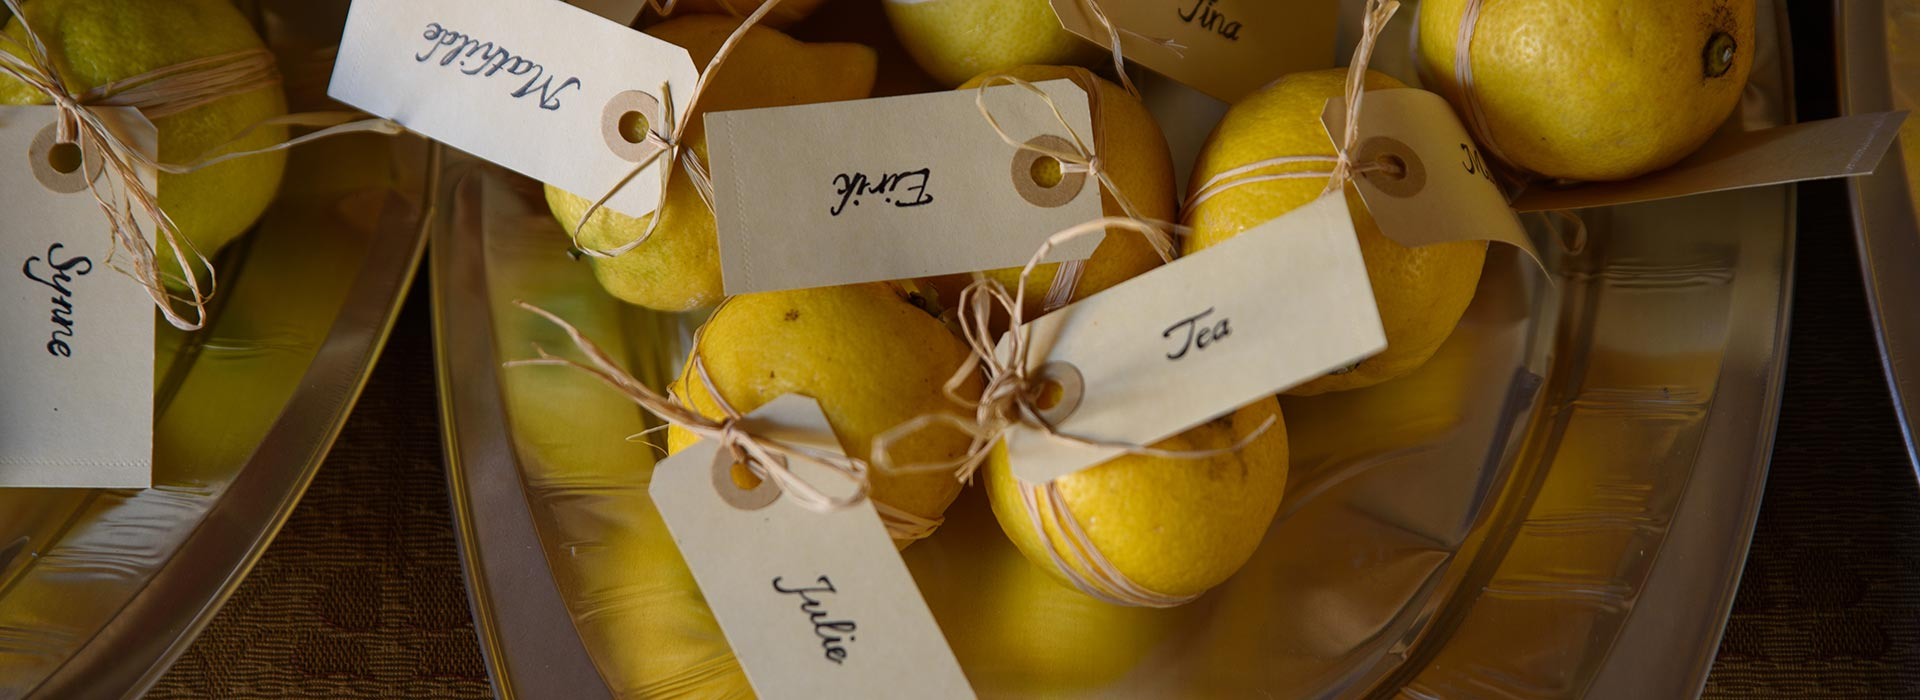 Royalty free wedding idea stock photography